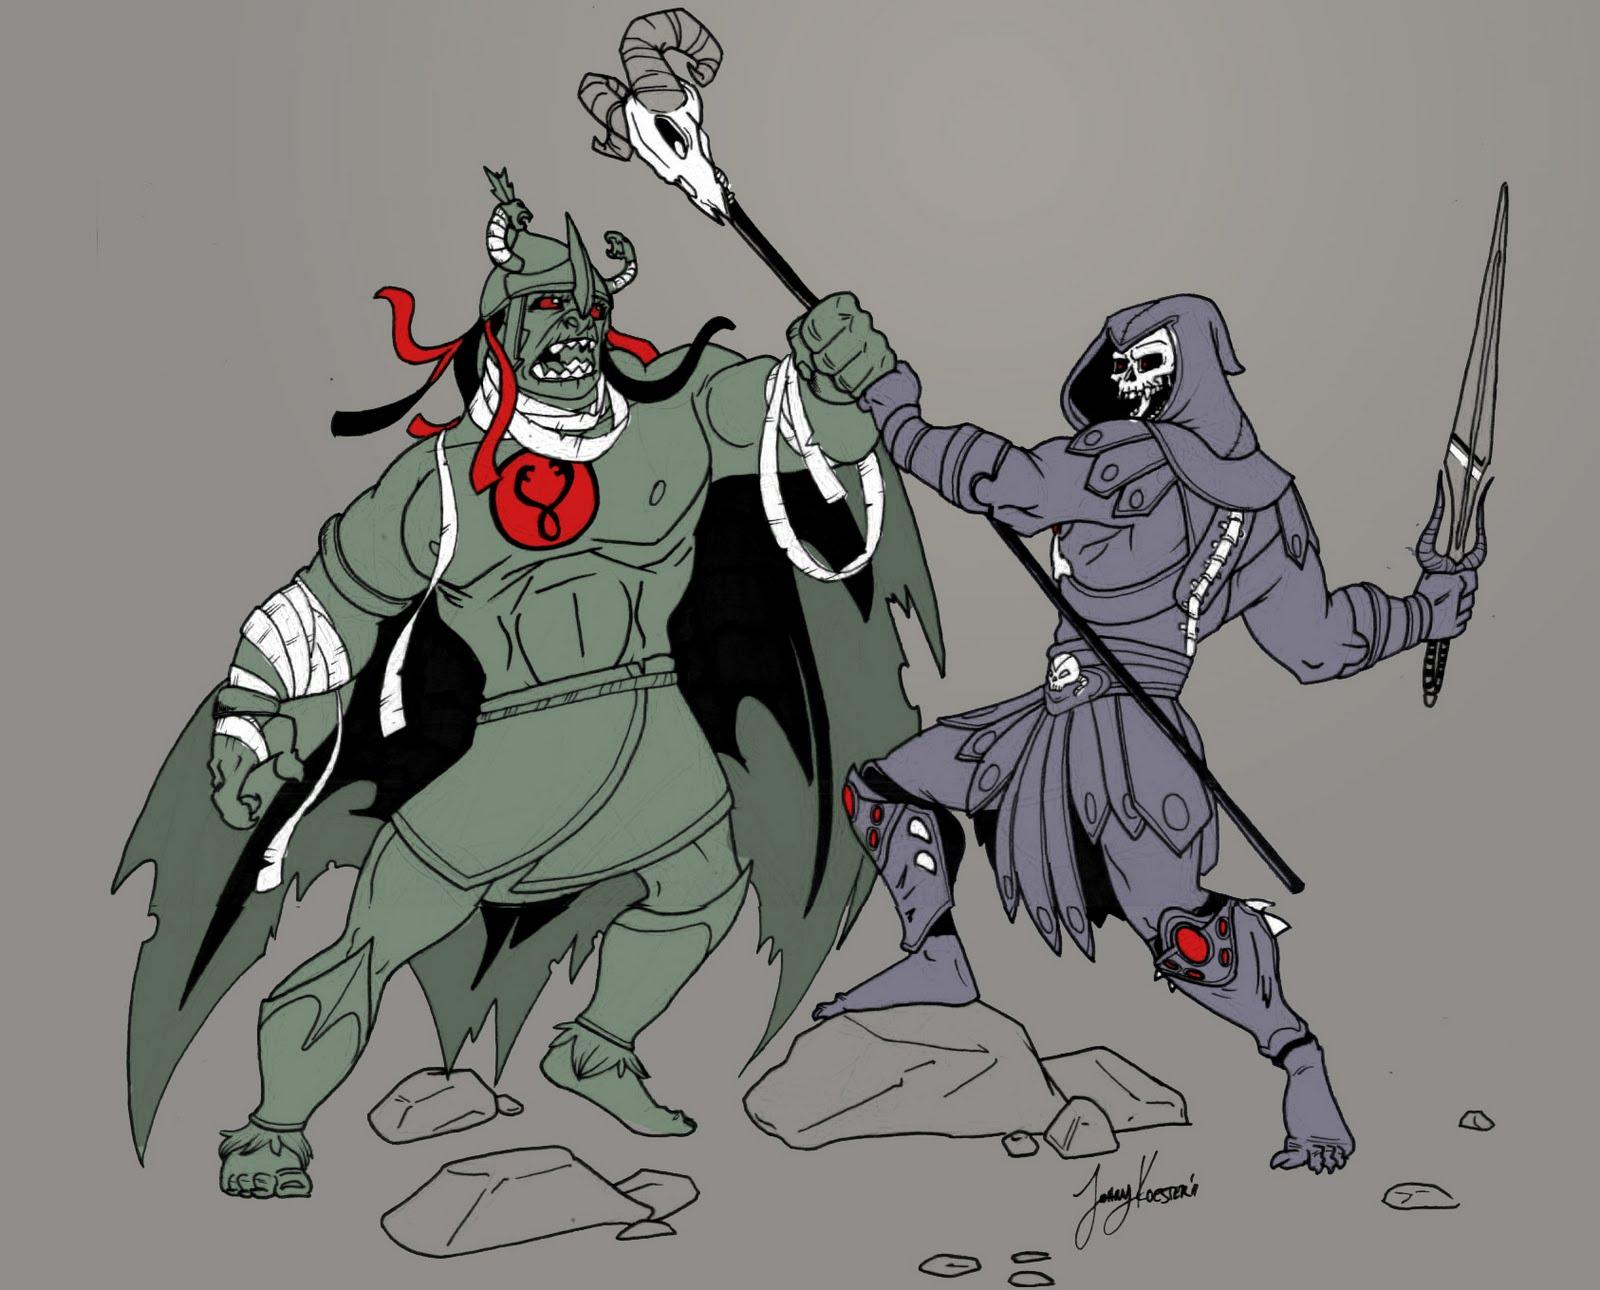 Pencil-in-Ear Studios: Master of Evil vs. the Ever-Living ...